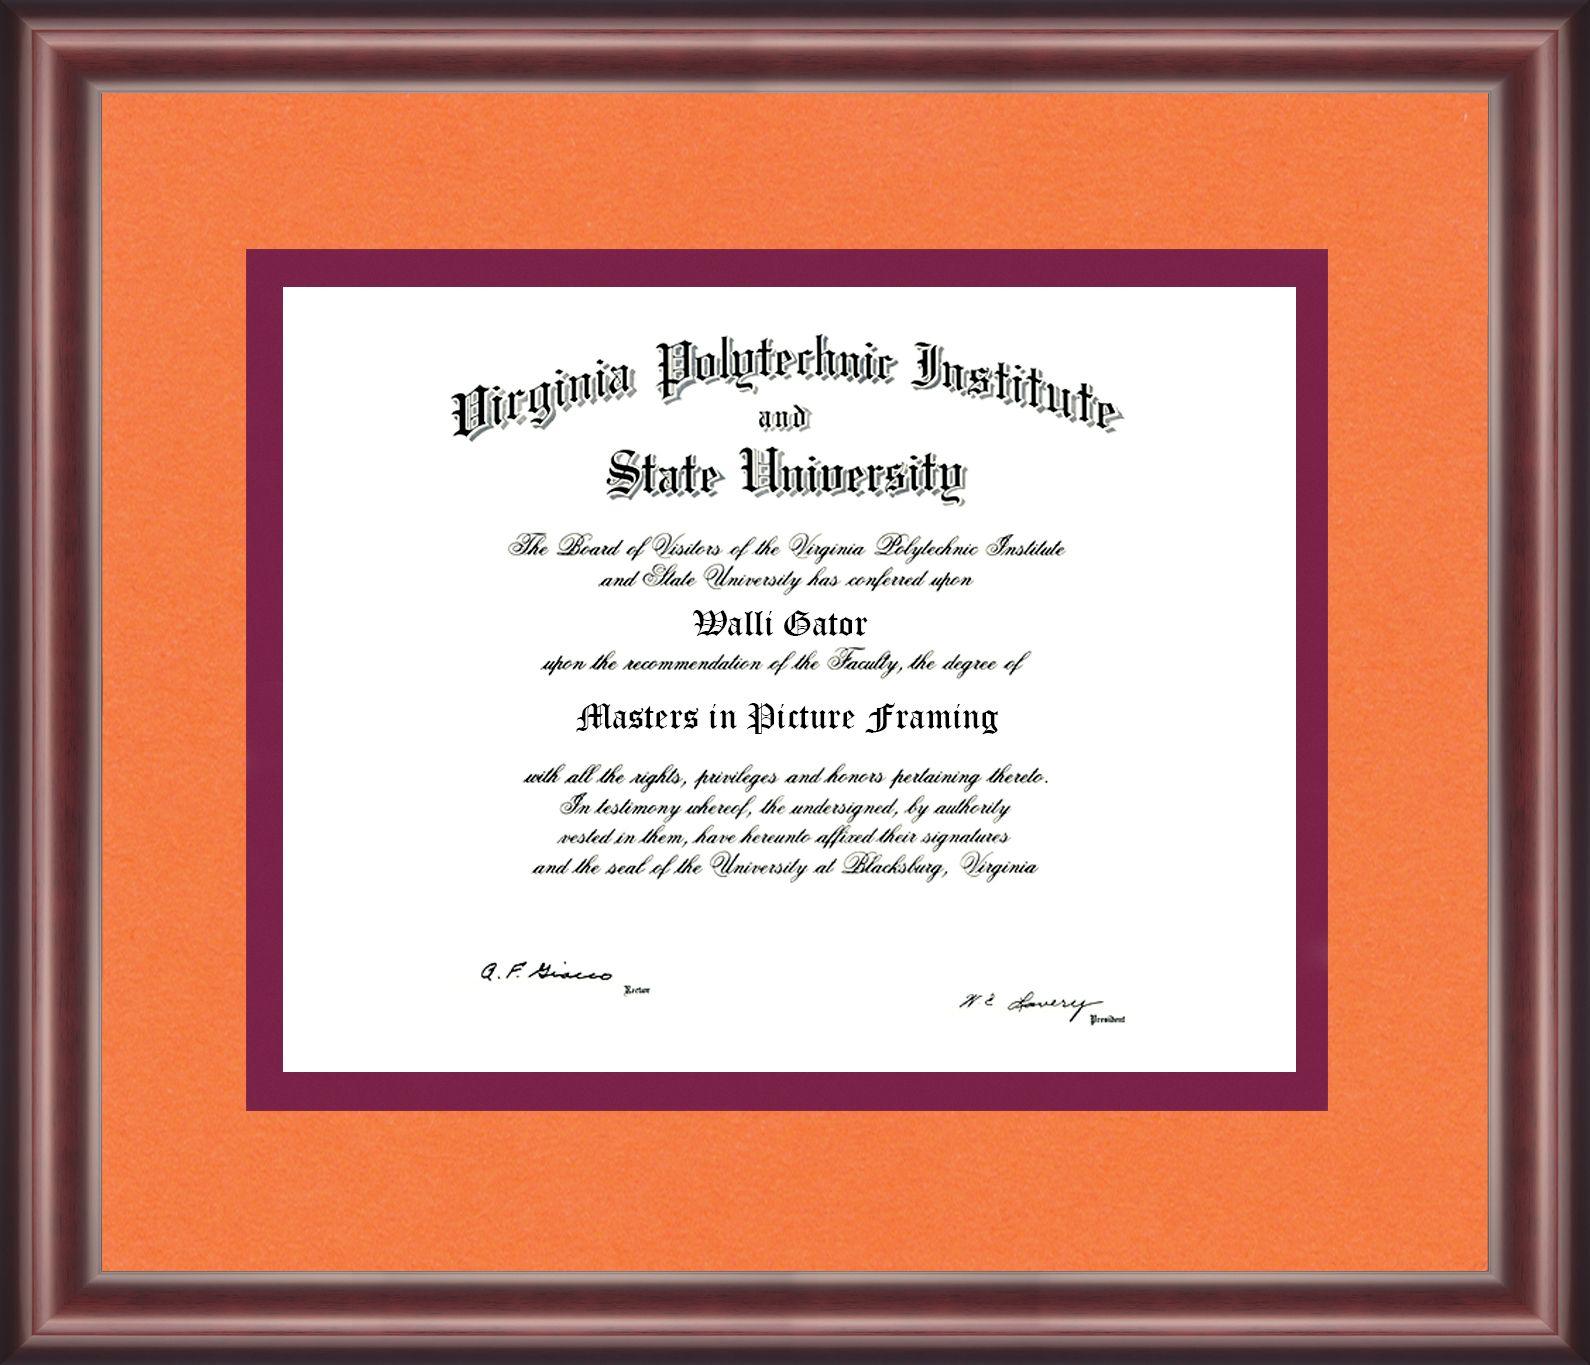 Virginia Tech Diploma Frane Talking Walls Tech School Diploma Frame Virginia Tech